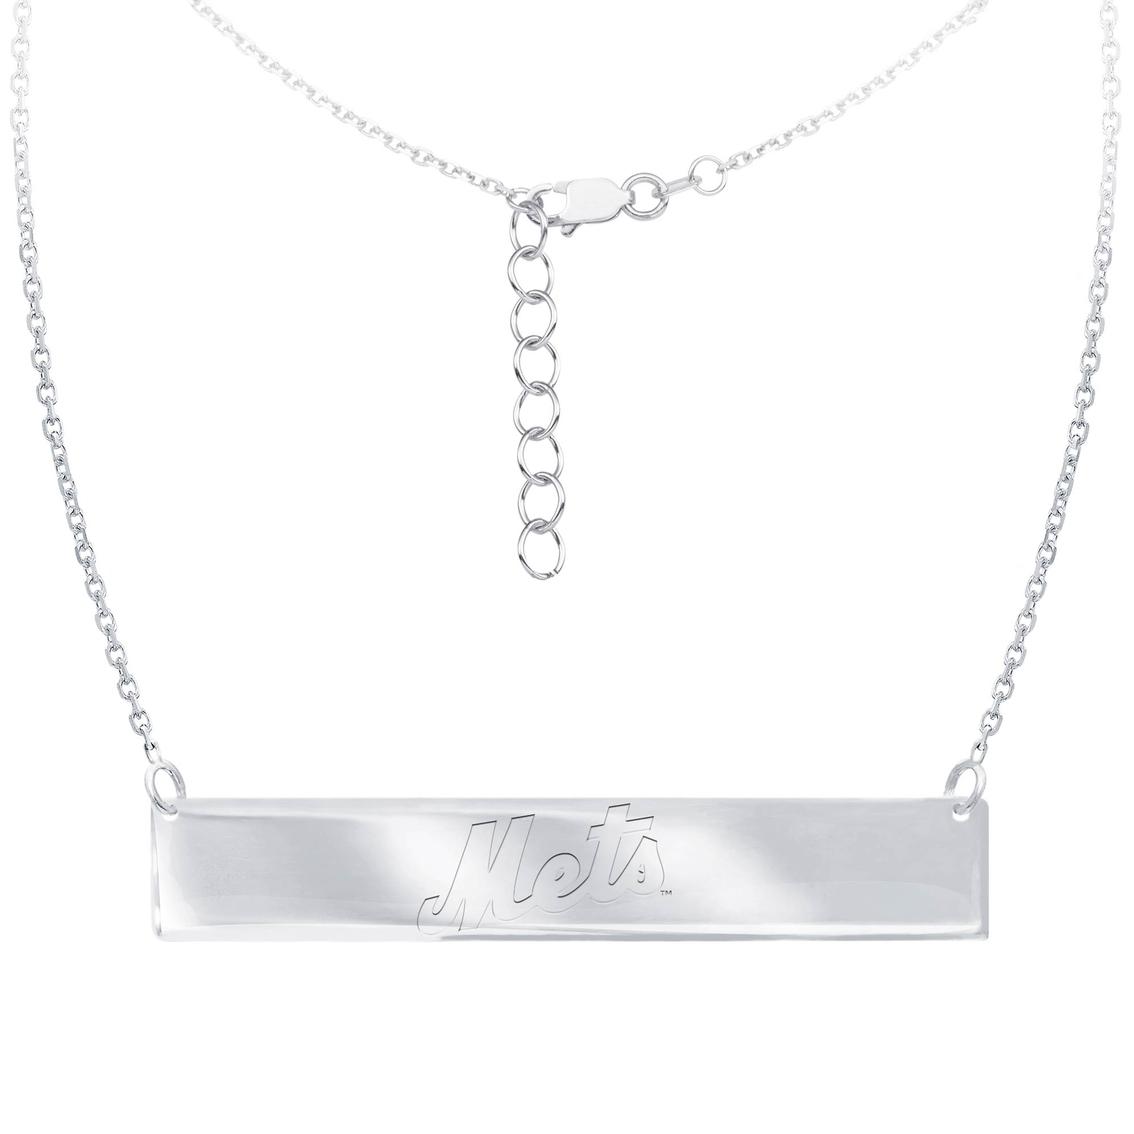 MLB New York Mets Bar Necklace DiamondJewelryNY Silver Pendant